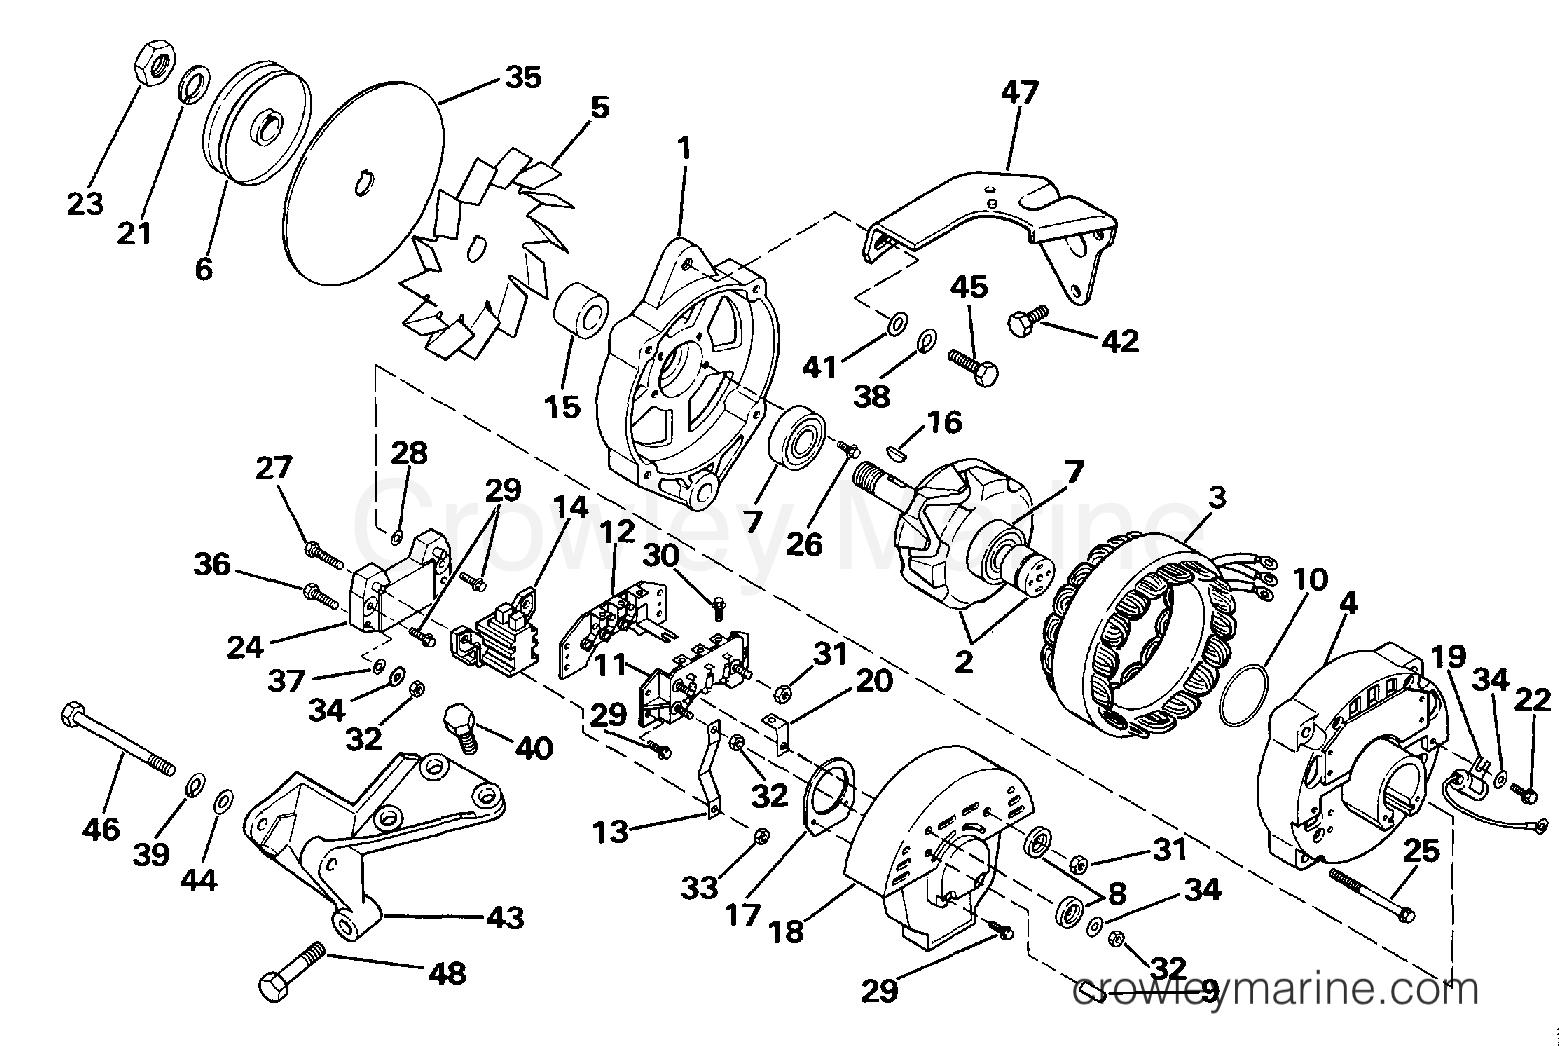 1990 OMC Stern Drive 2.3 - 232BMRPWS ALTERNATOR section